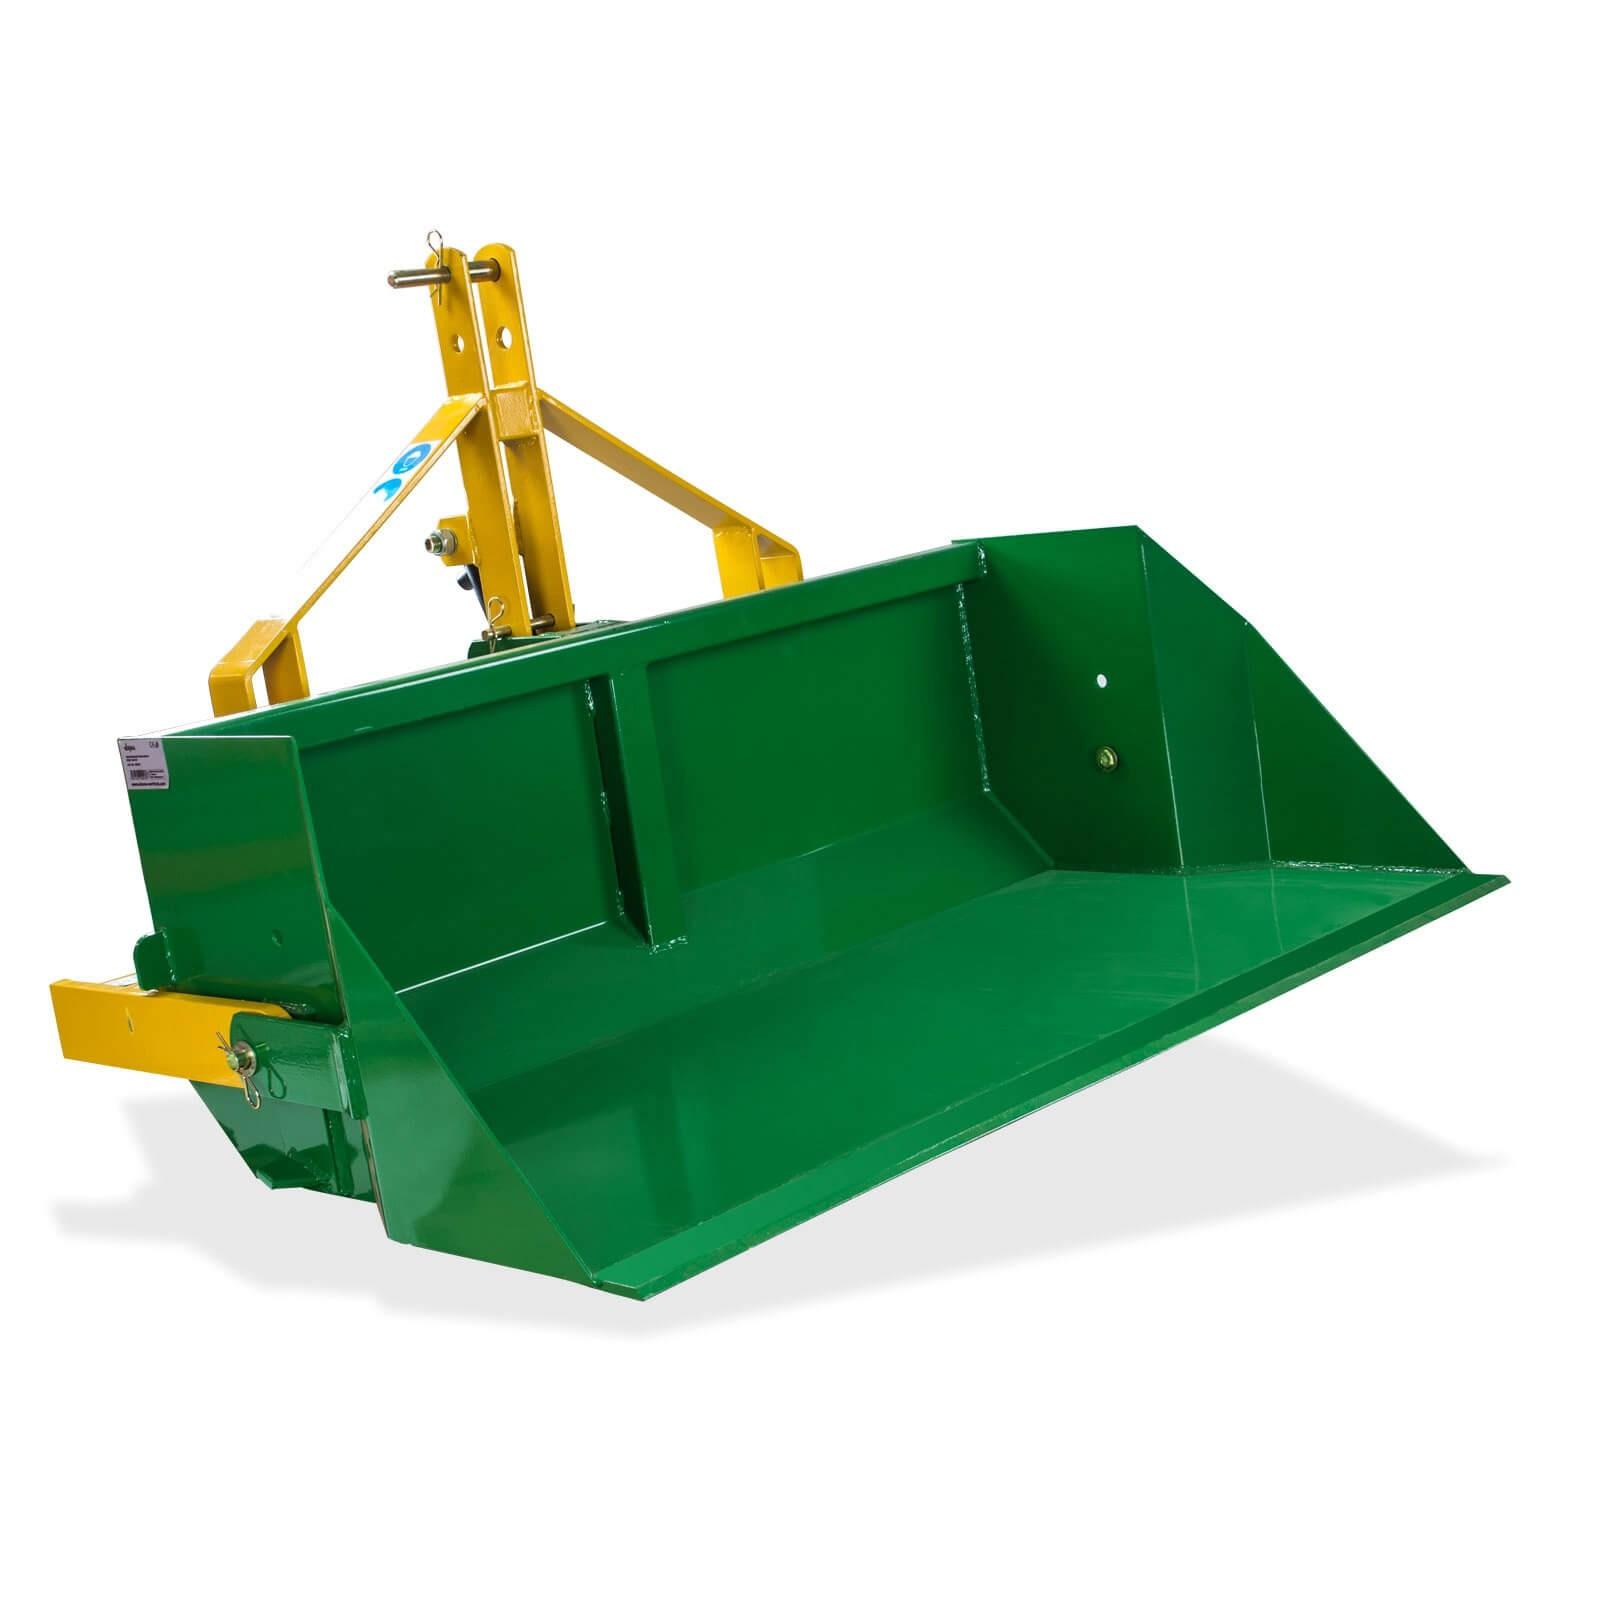 Dema Traktor Heckschaufel Hydraulik Schaufel Kippschaufel Kippmulde hydraulisch 500kg 52047